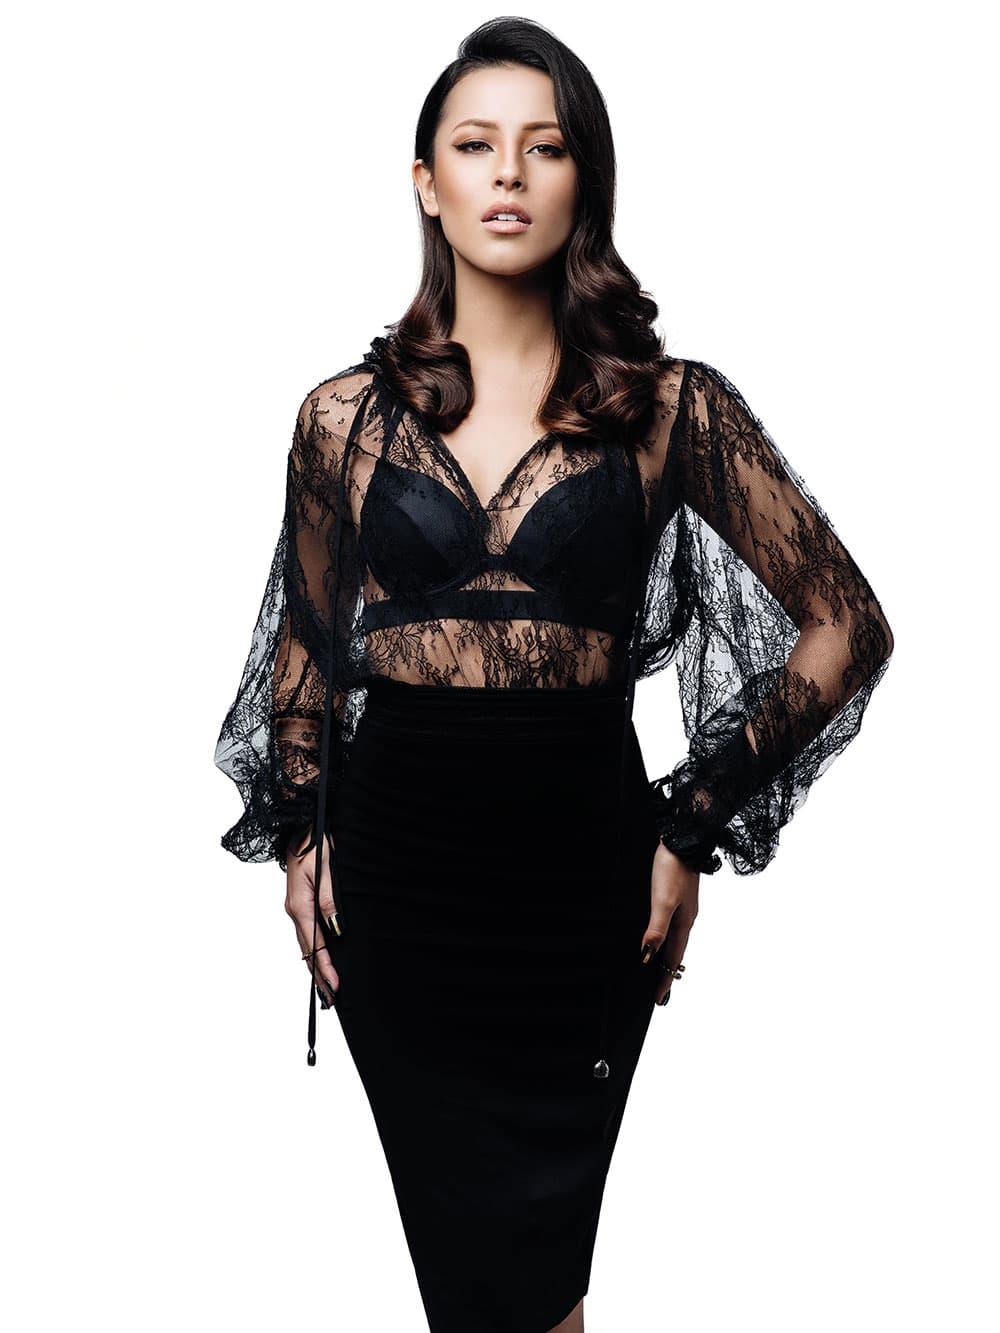 Kisah Perjalanan Karier Nina Kozok